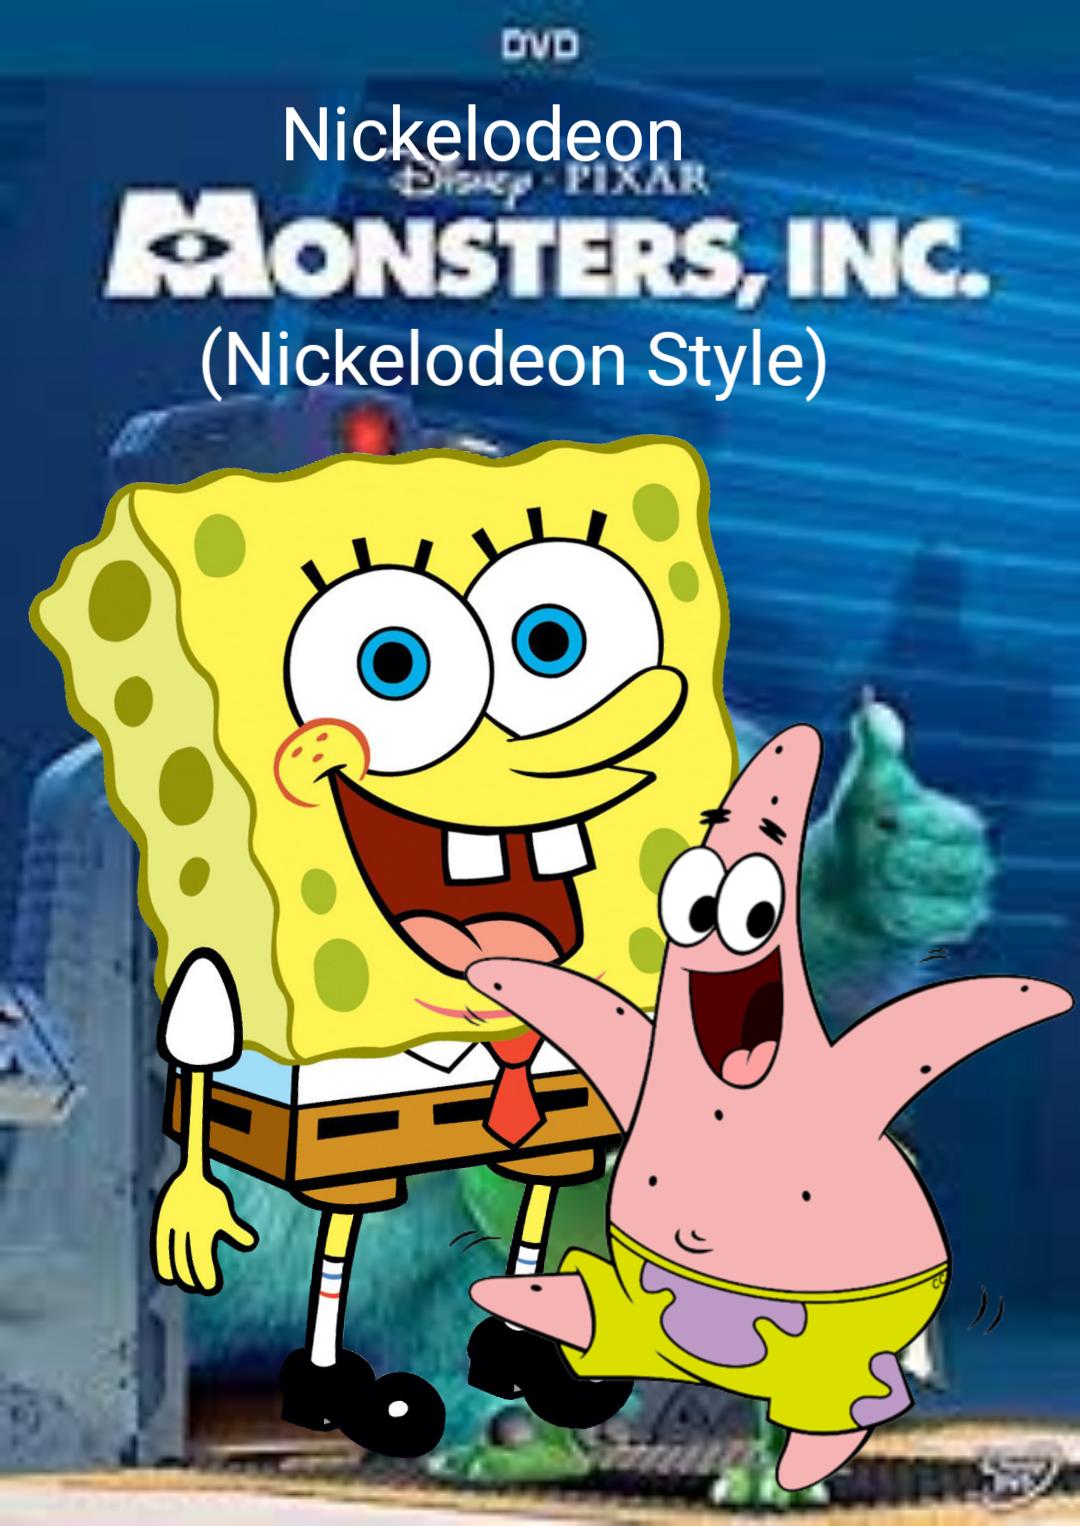 Monsters, Inc. (Nickelodeon Style)